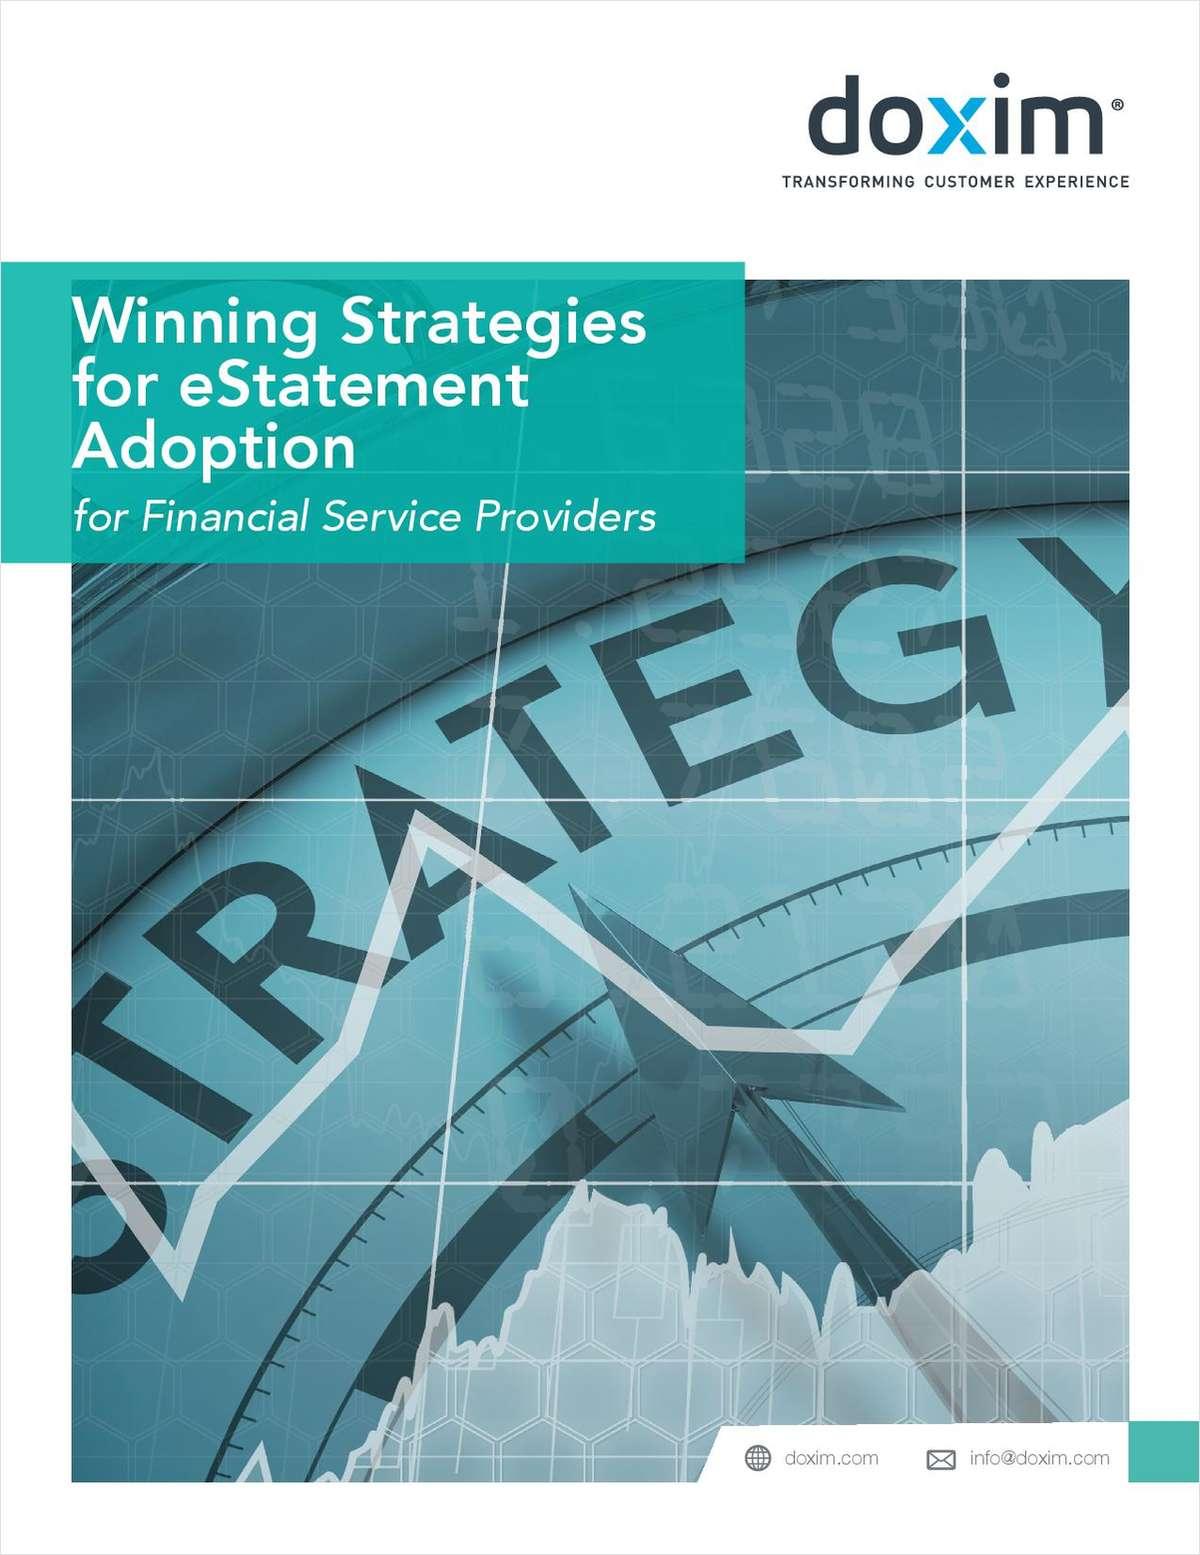 Winning Strategies for E-Statement Adoption